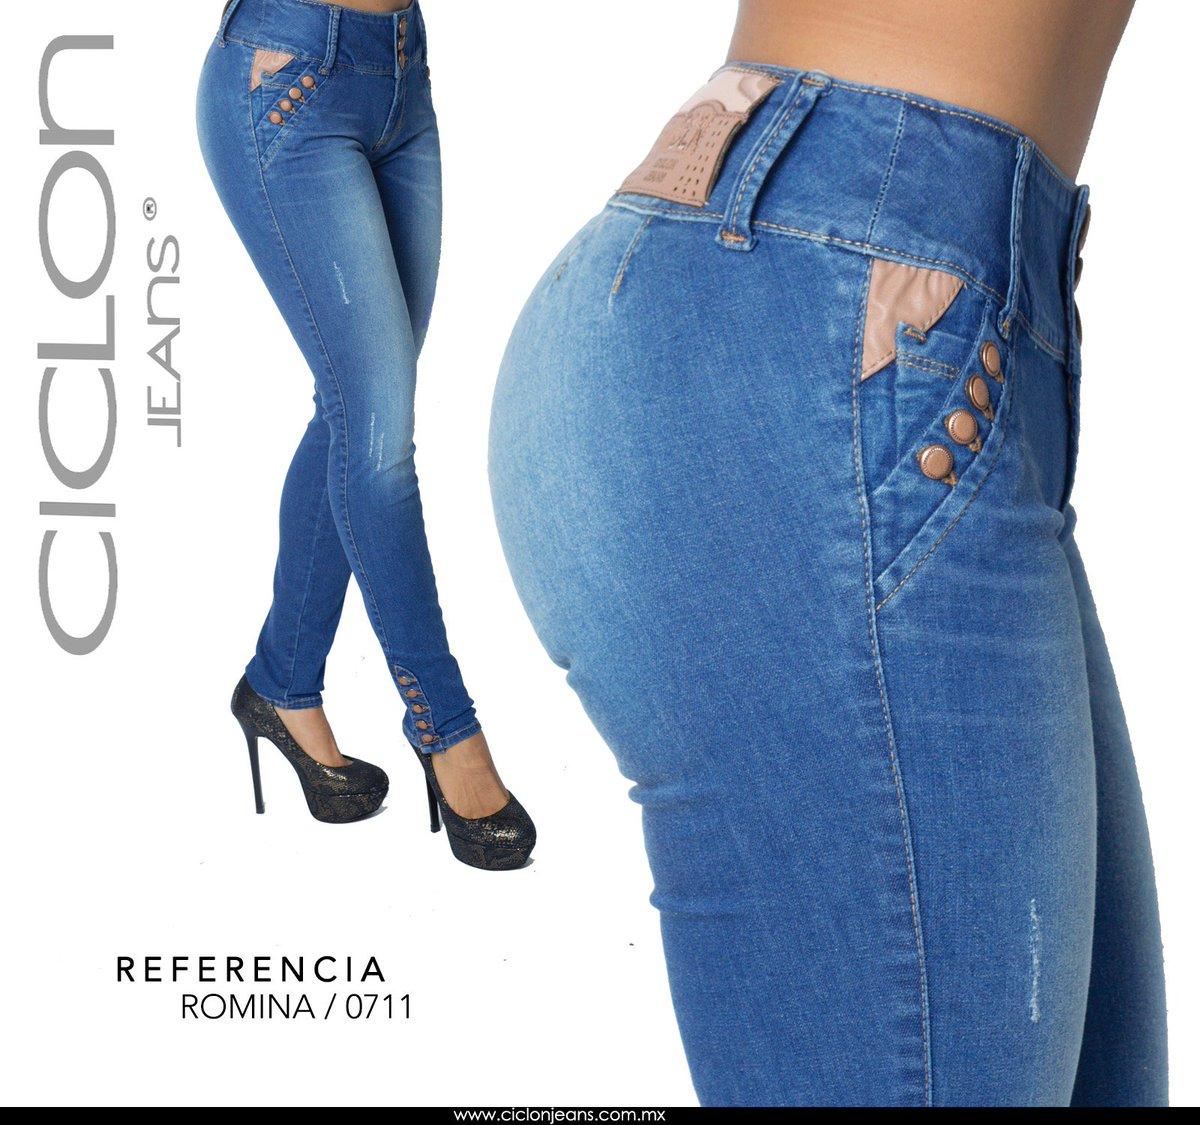 World Jeans Premium En Twitter Nuevos Modelos Contactanos Via Whatsapp 3316652350 O Por Facebook World Jeans Premium